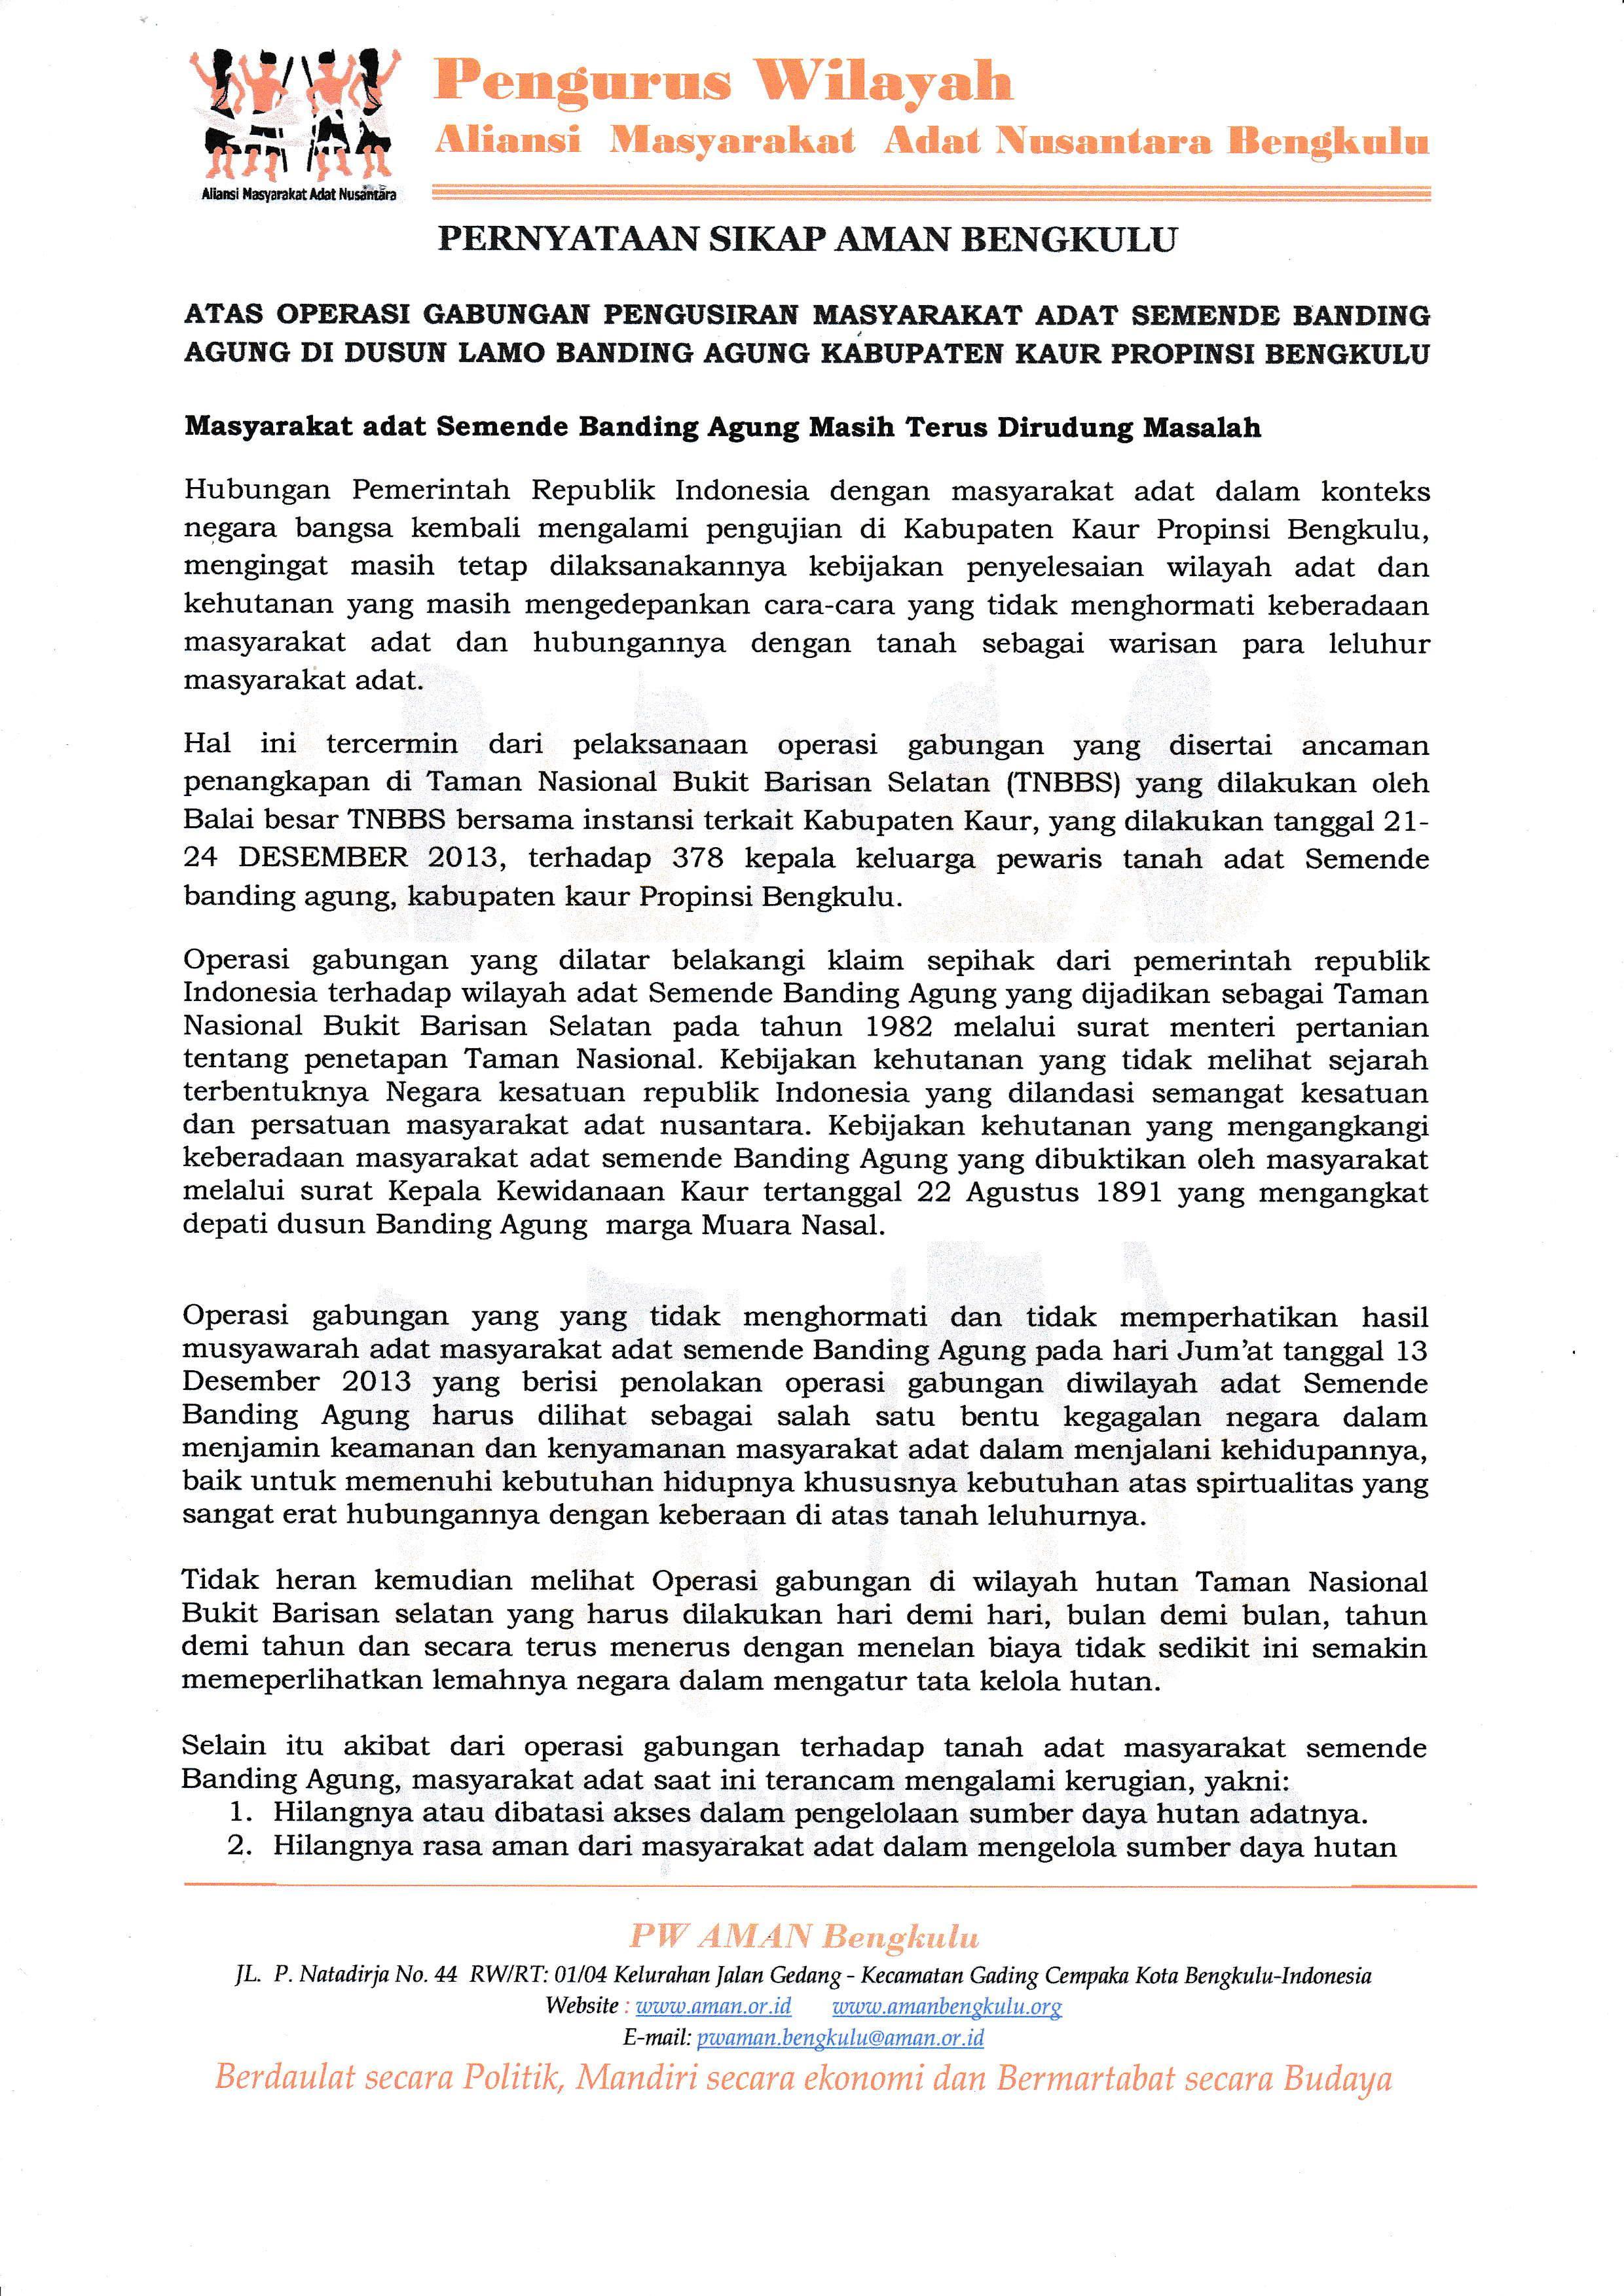 Pernyataan Sikap PW AMAN Bengkulu atas Pengusiran Masyarakat Adat Semende Banding Agung